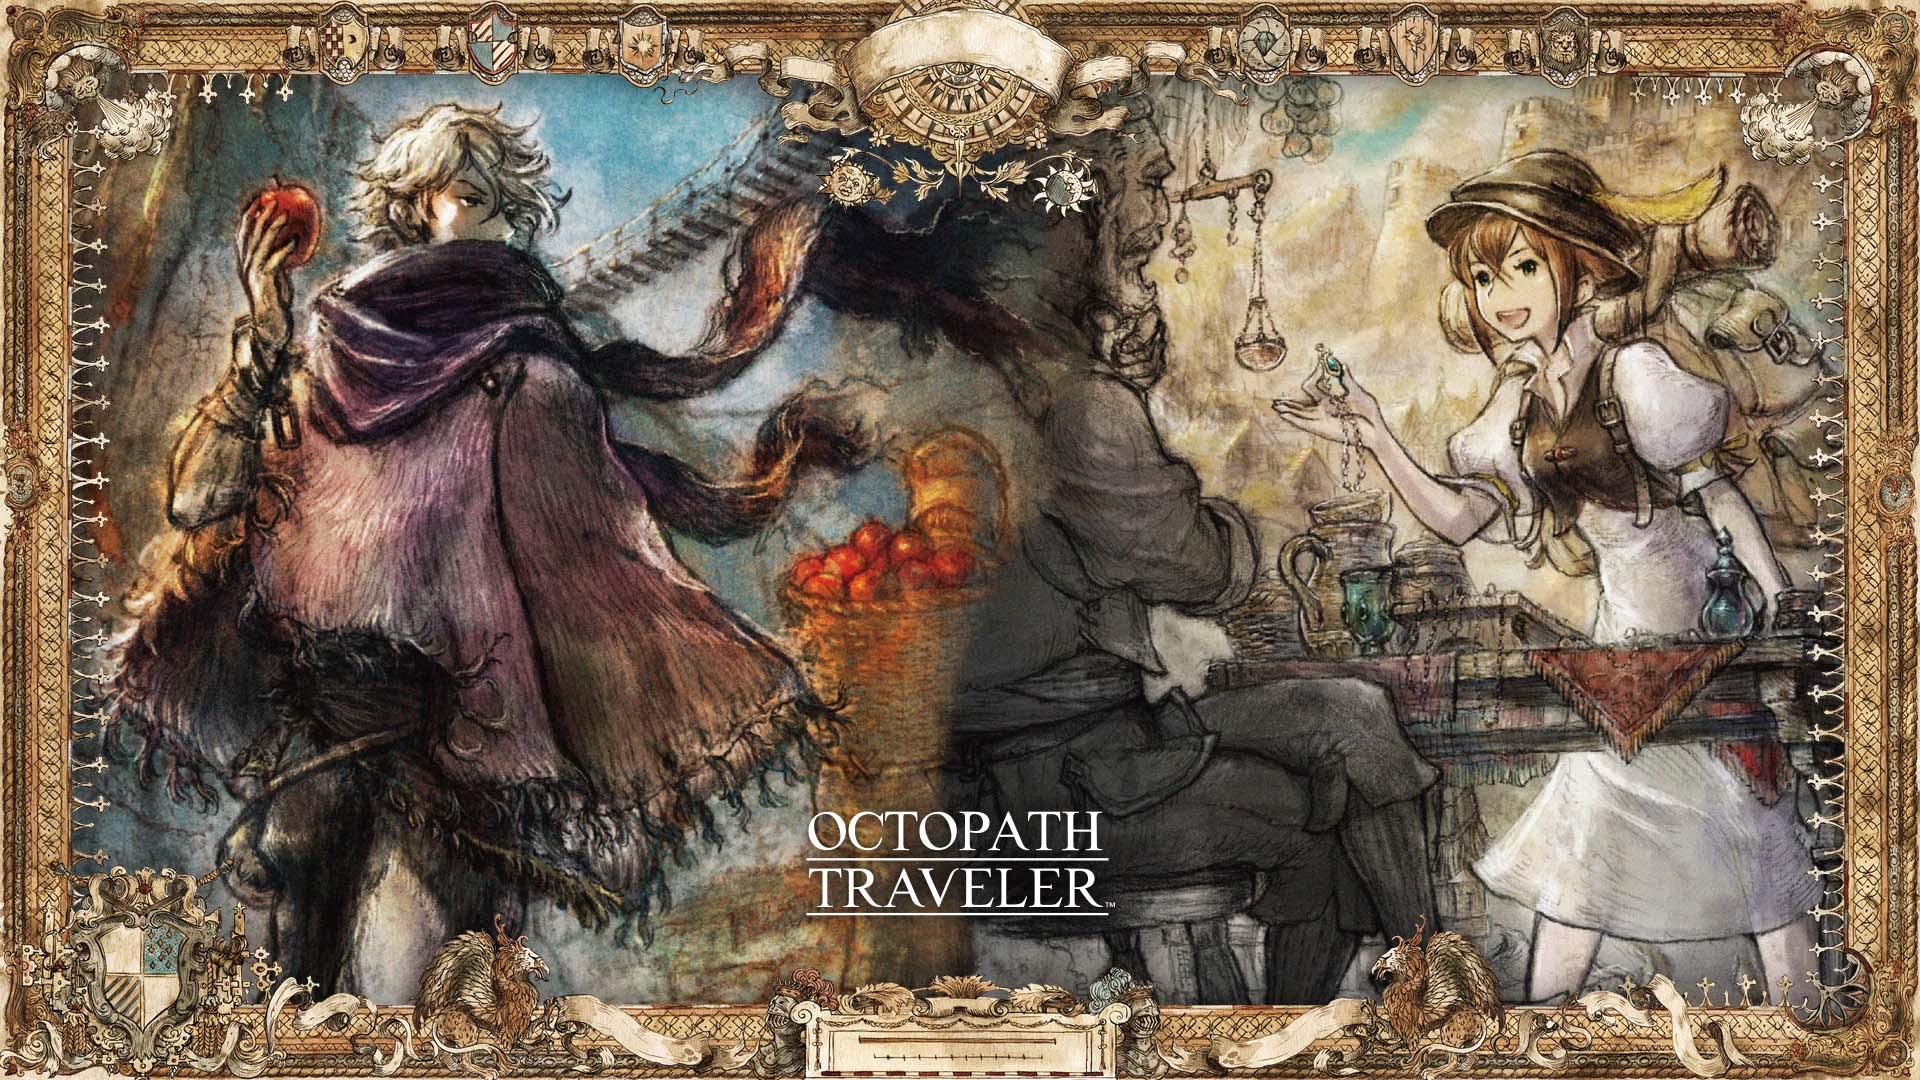 Octopath Traveler Wallpaper Hd - HD Blast